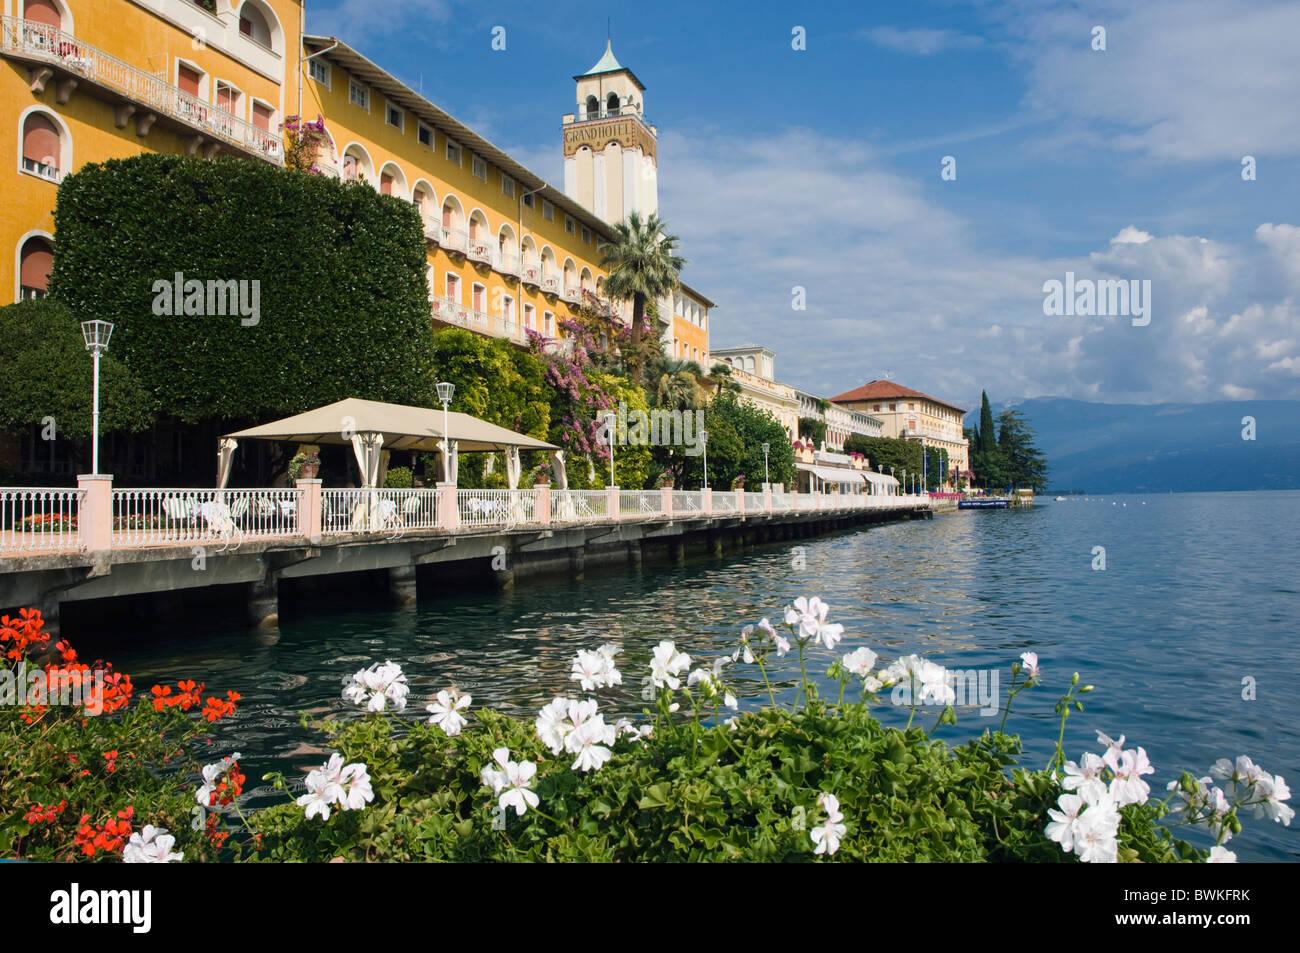 Hotels Gardone Riviera Italy